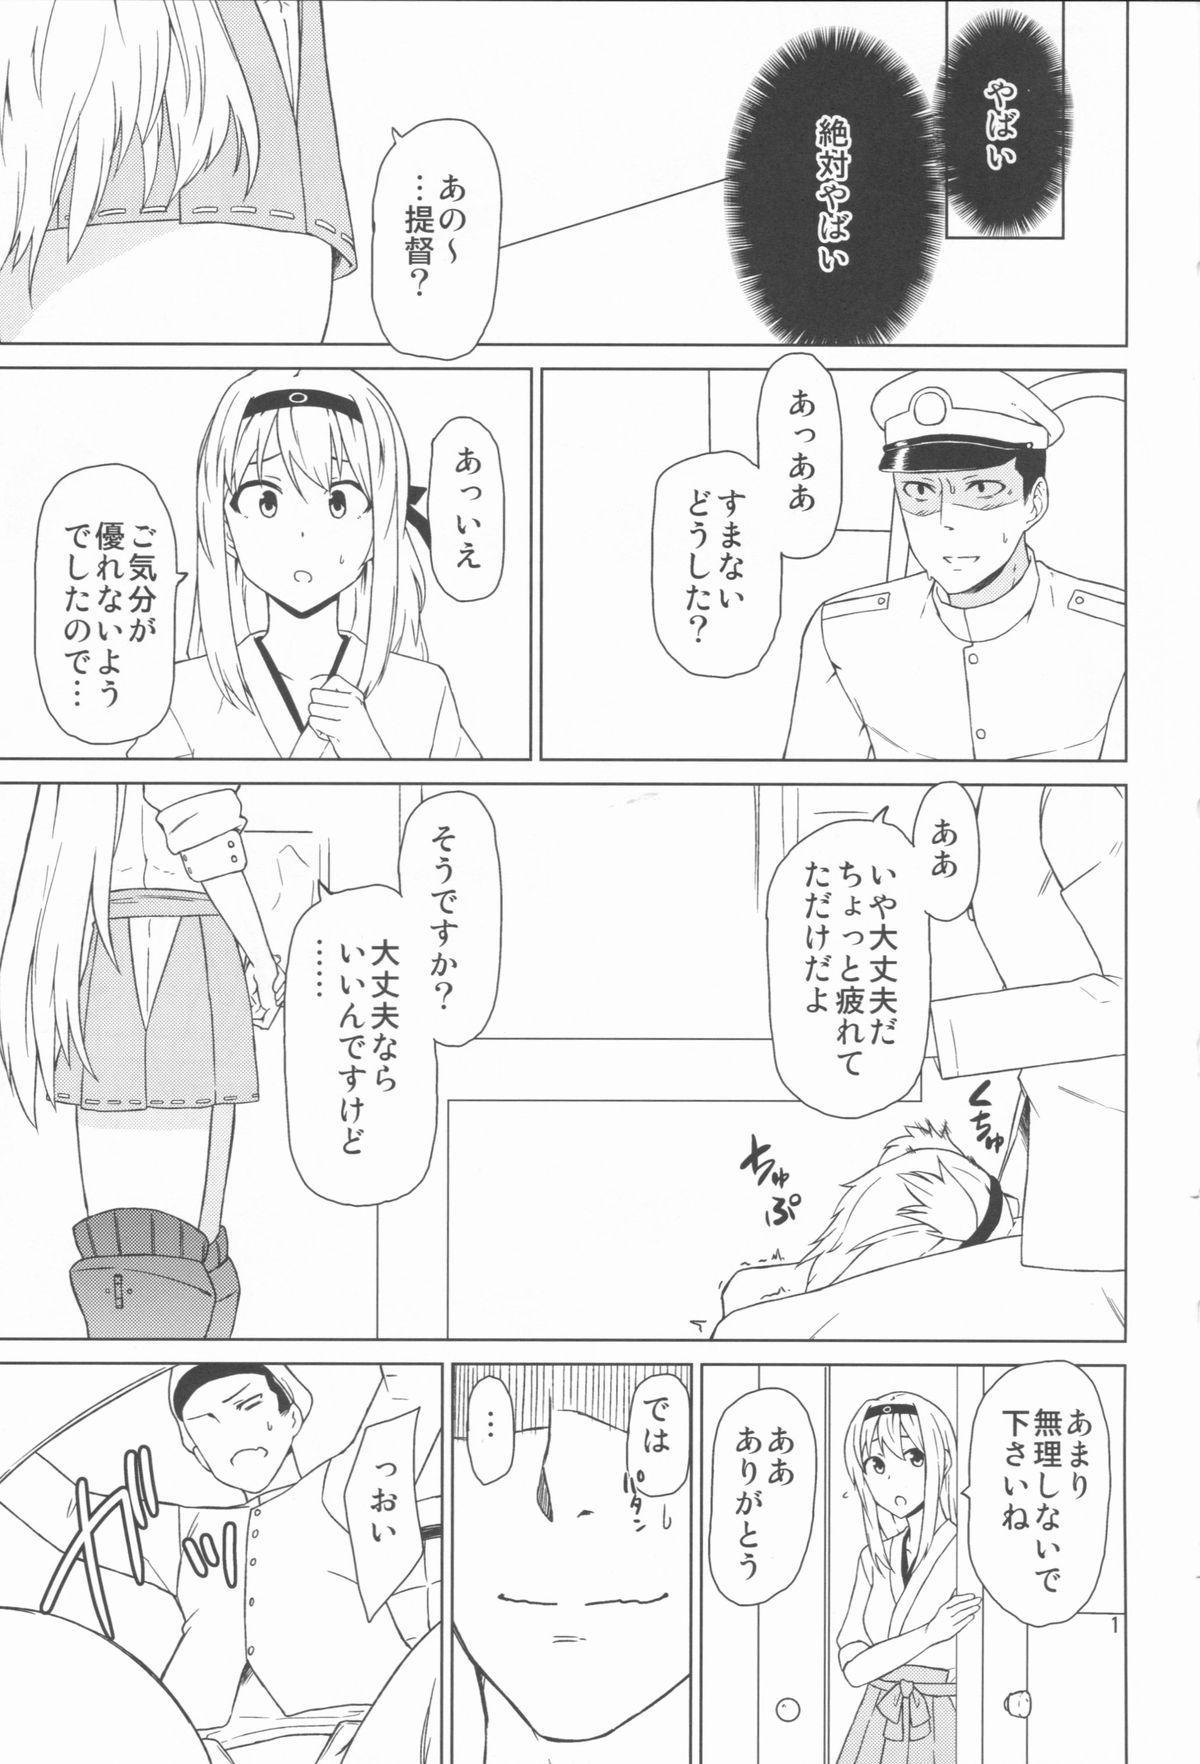 Musashi Route 2